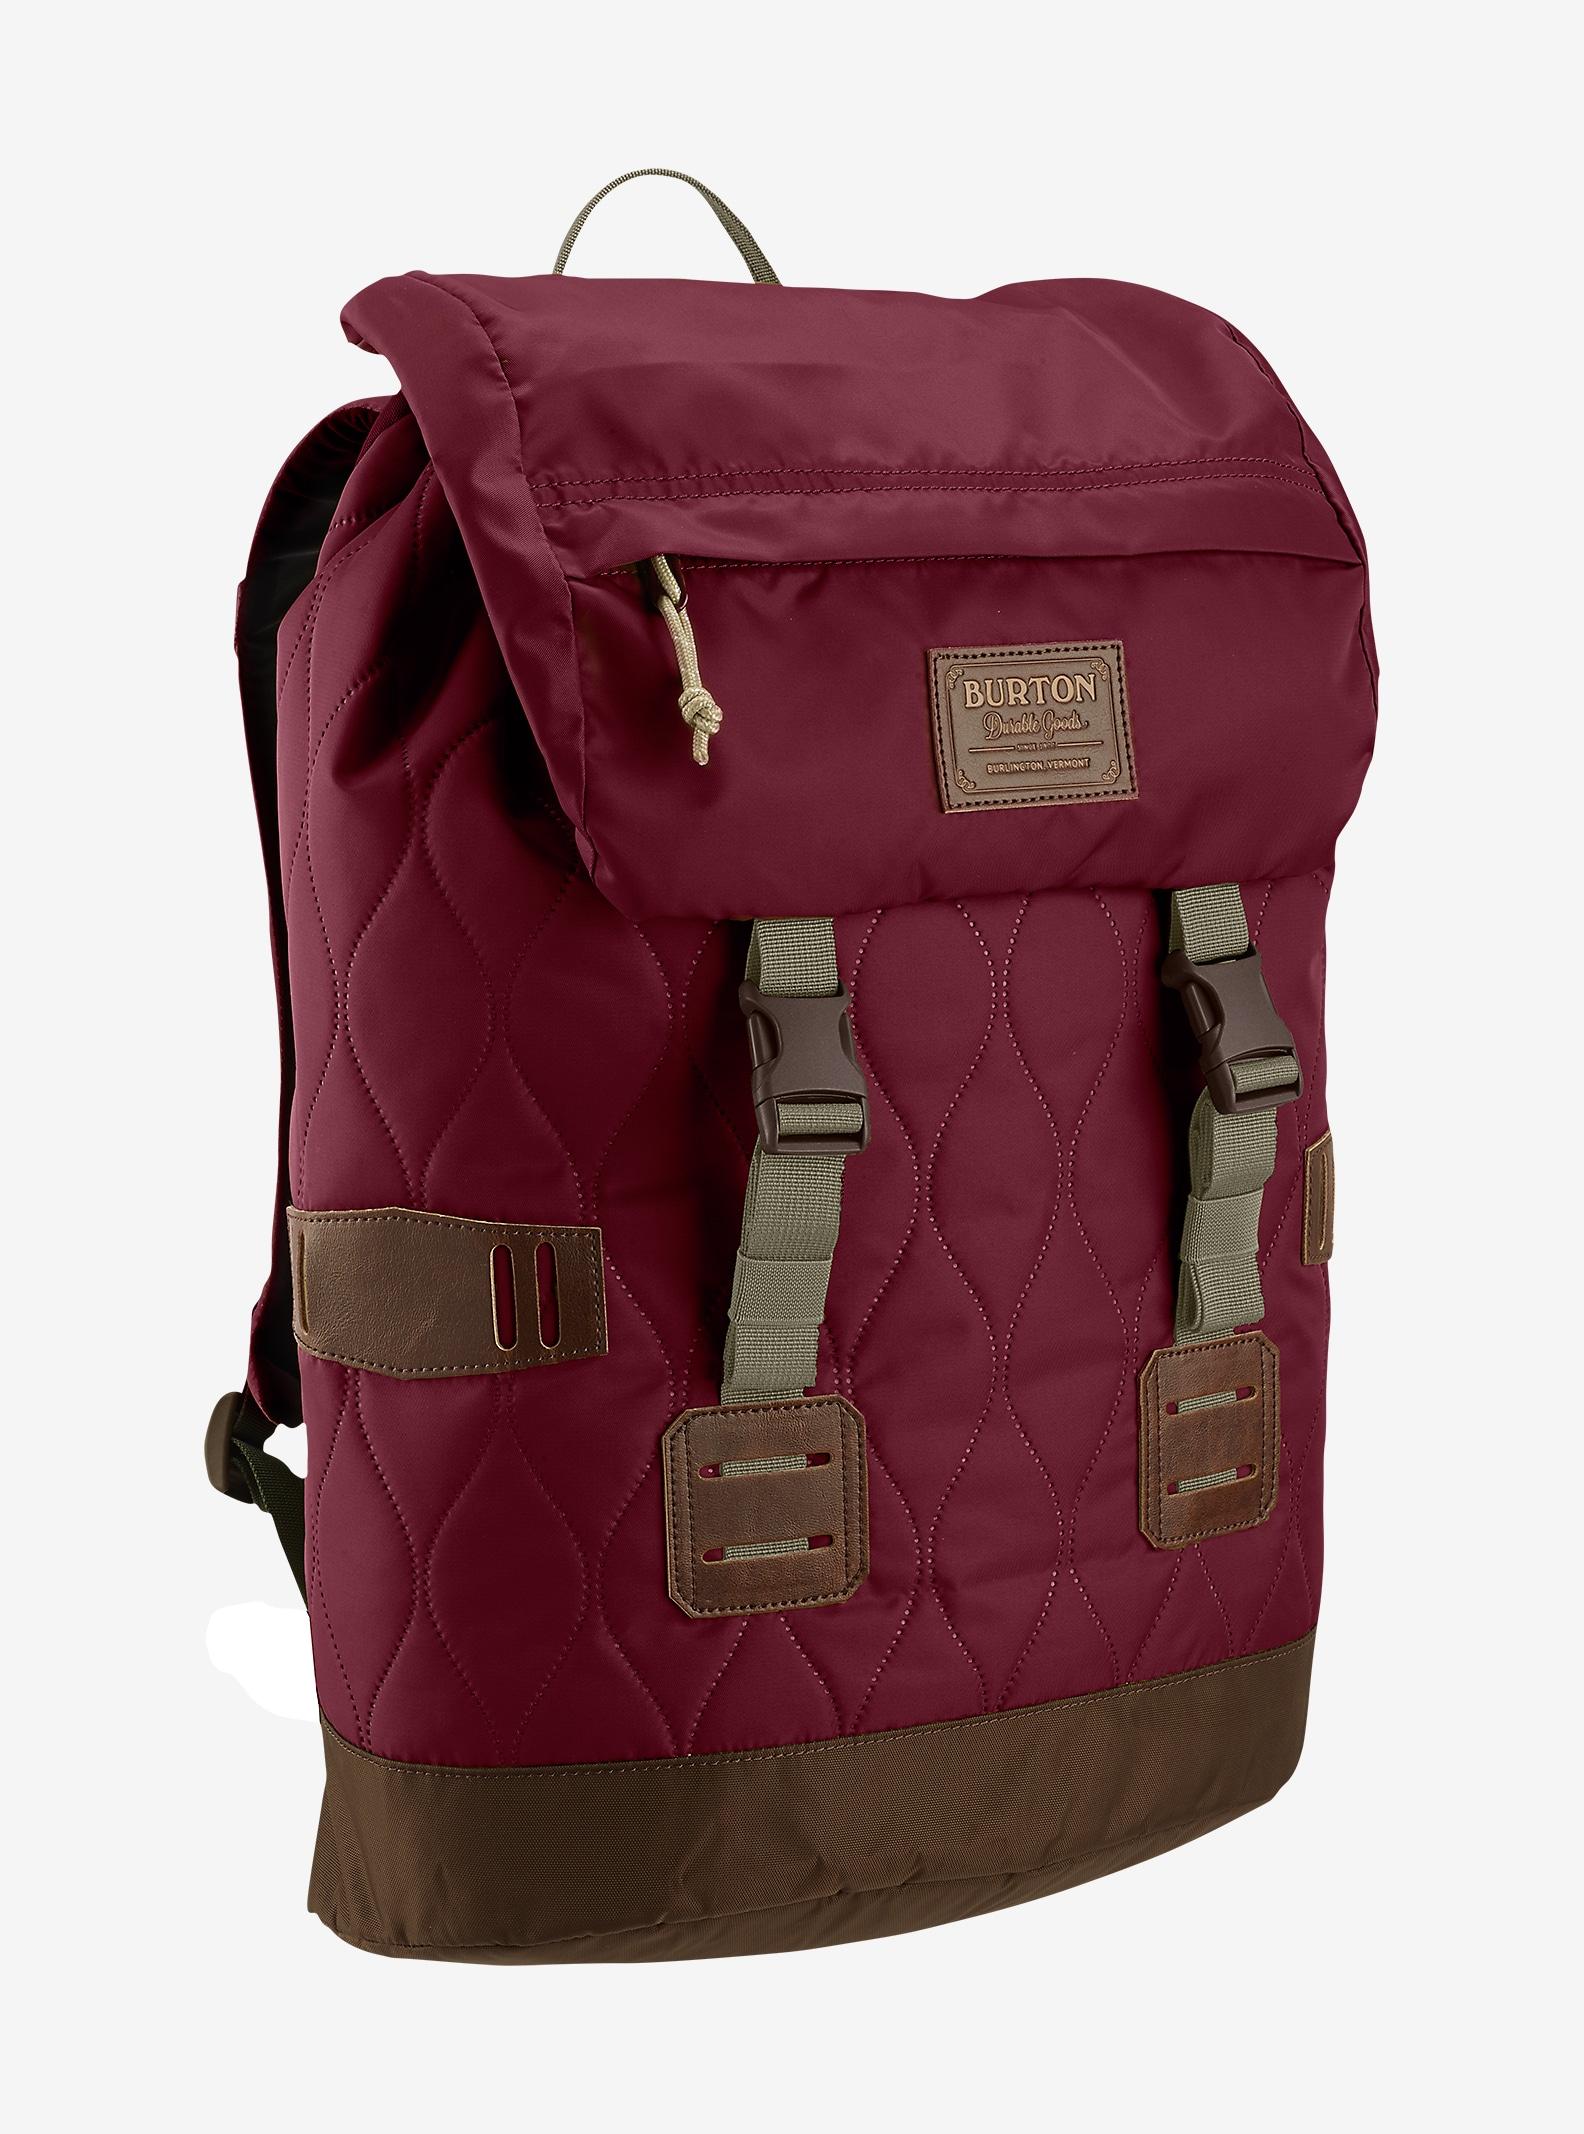 Burton Women's Tinder Backpack shown in Quilted Zinfandel